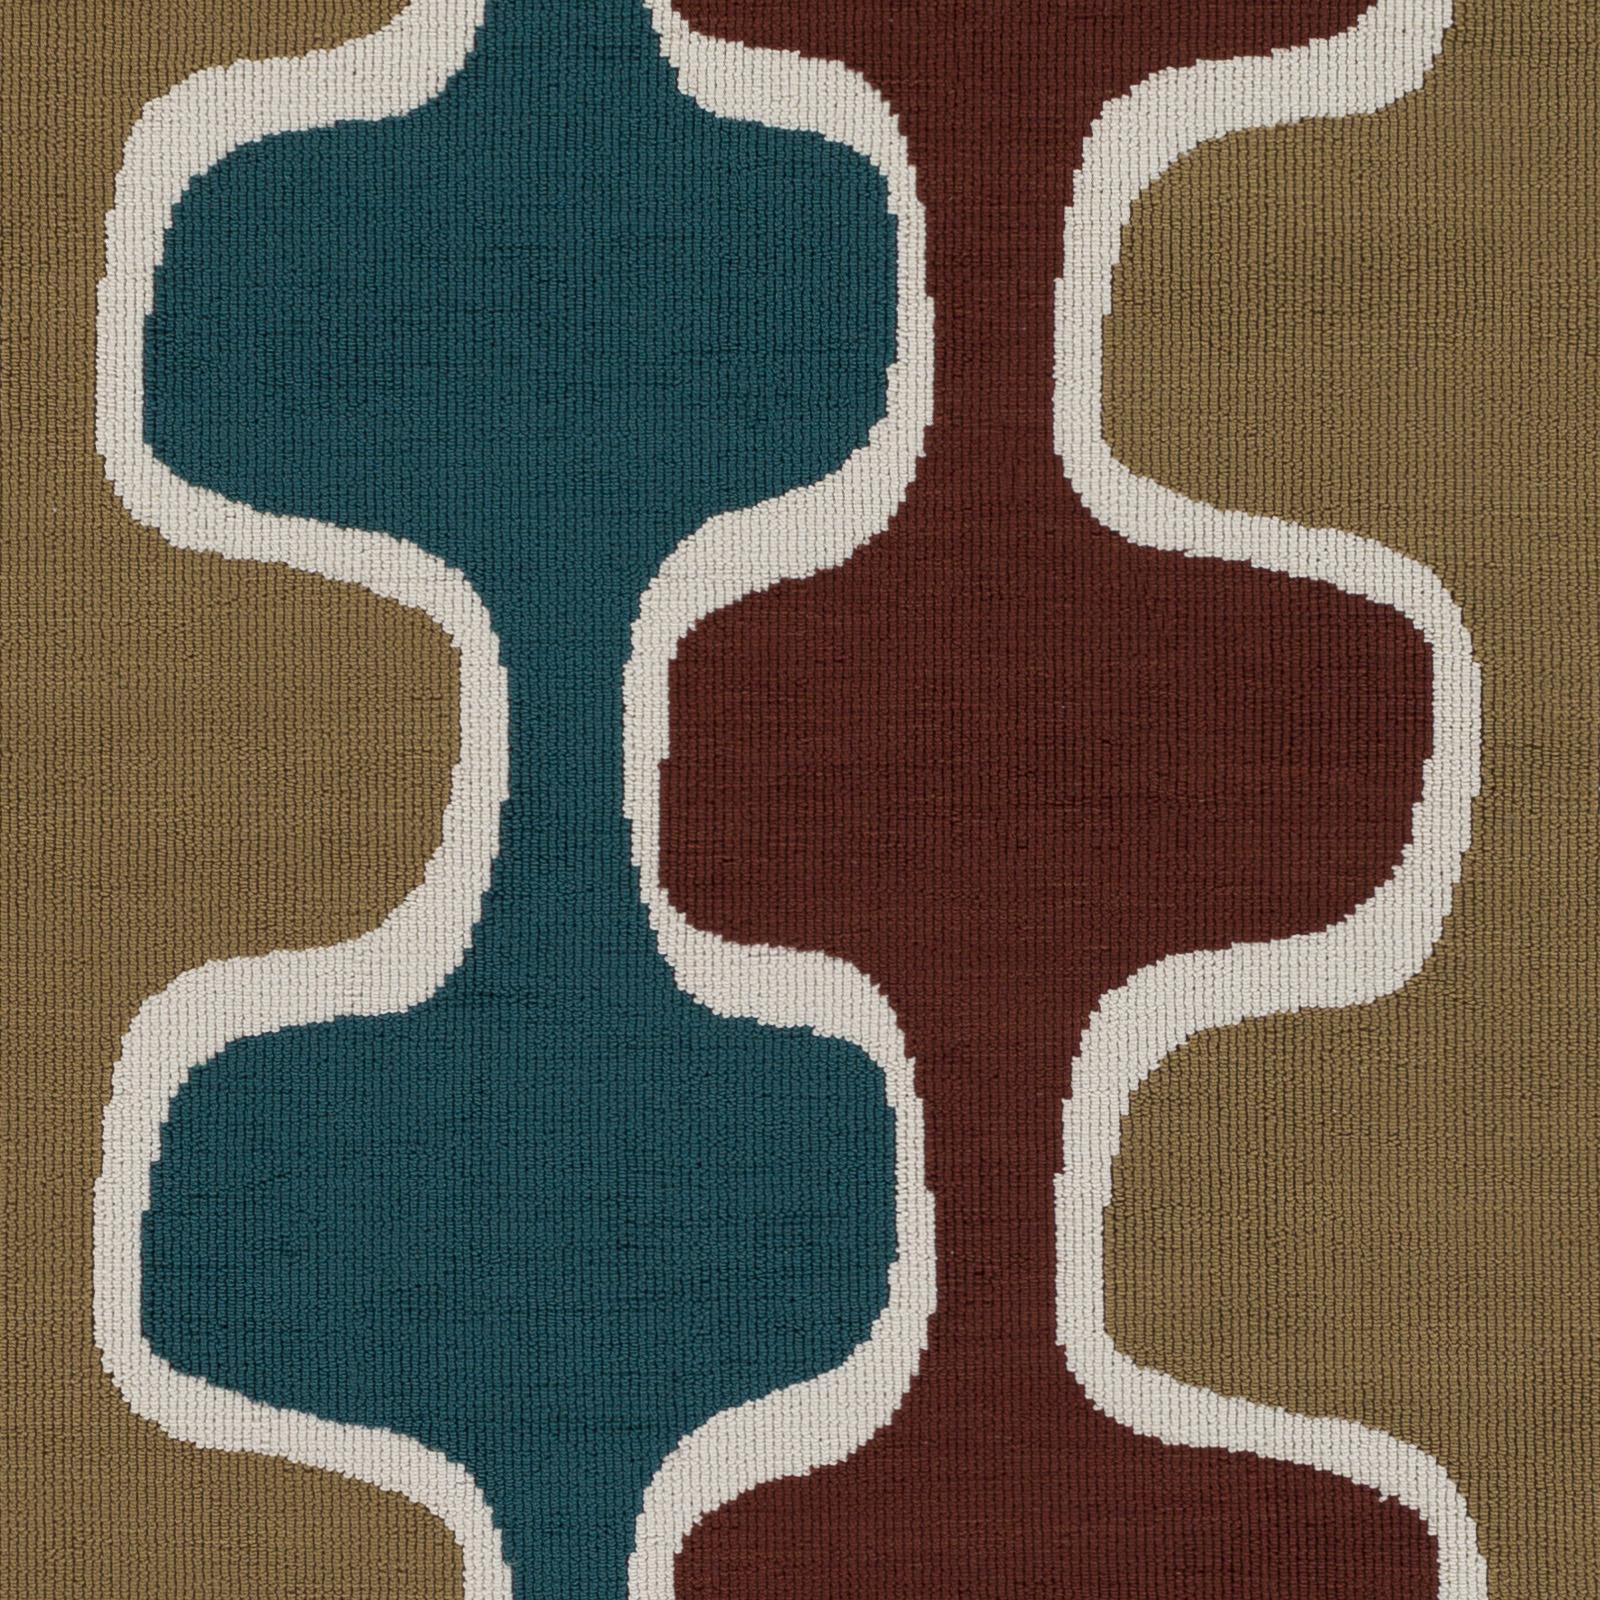 Artistic Weavers Joan JOAN-6069 Clermont Teal/Rust/Gold Rug